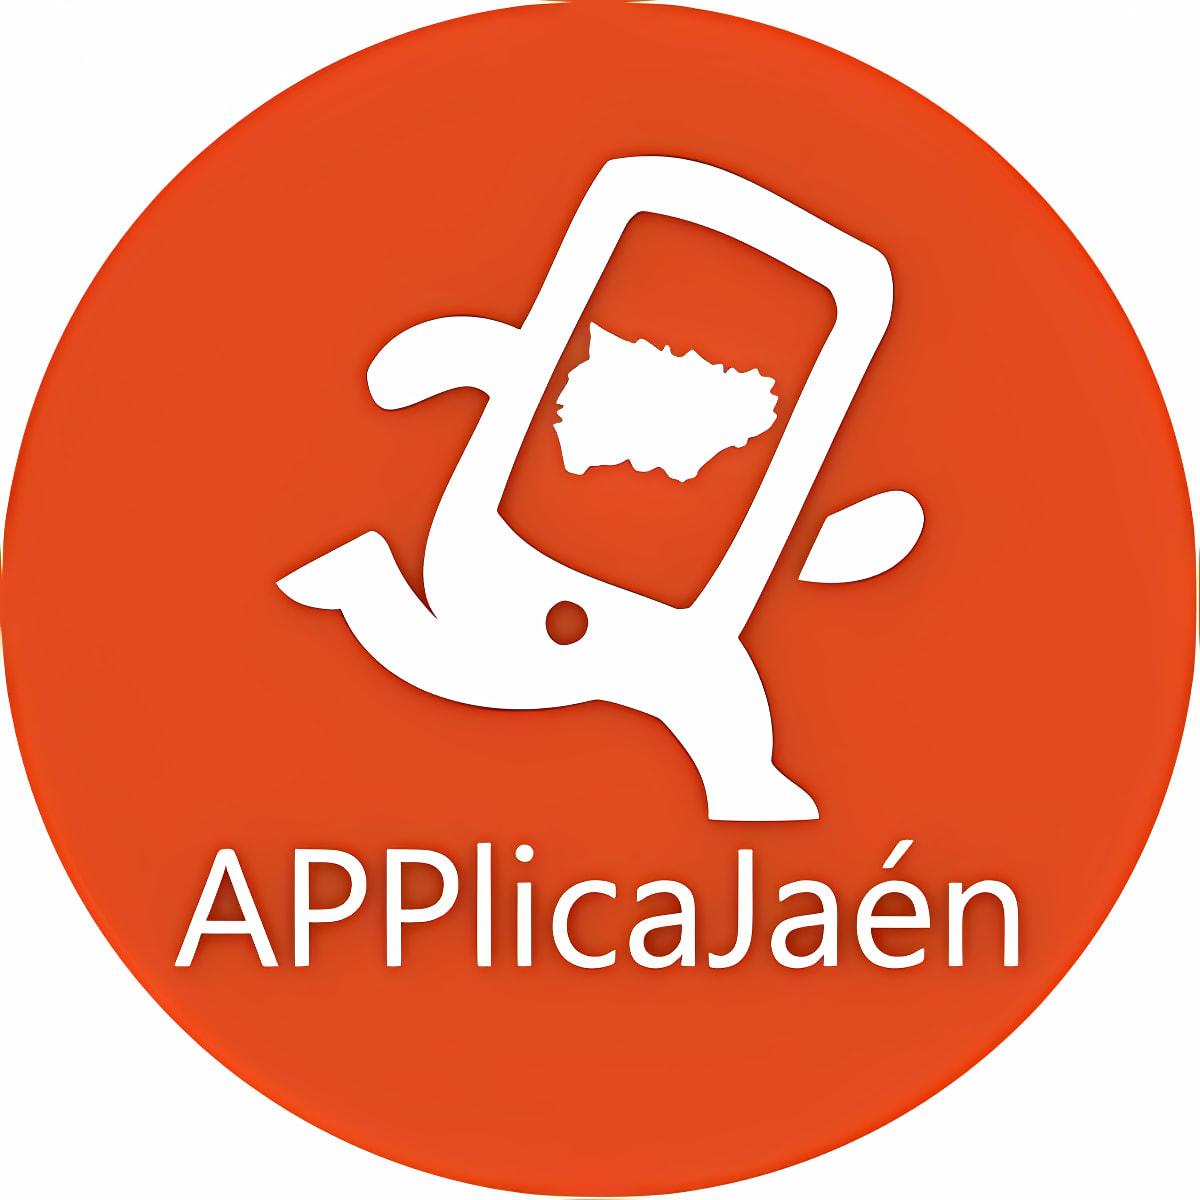 APPlicaJaen | Turismo de Jaén